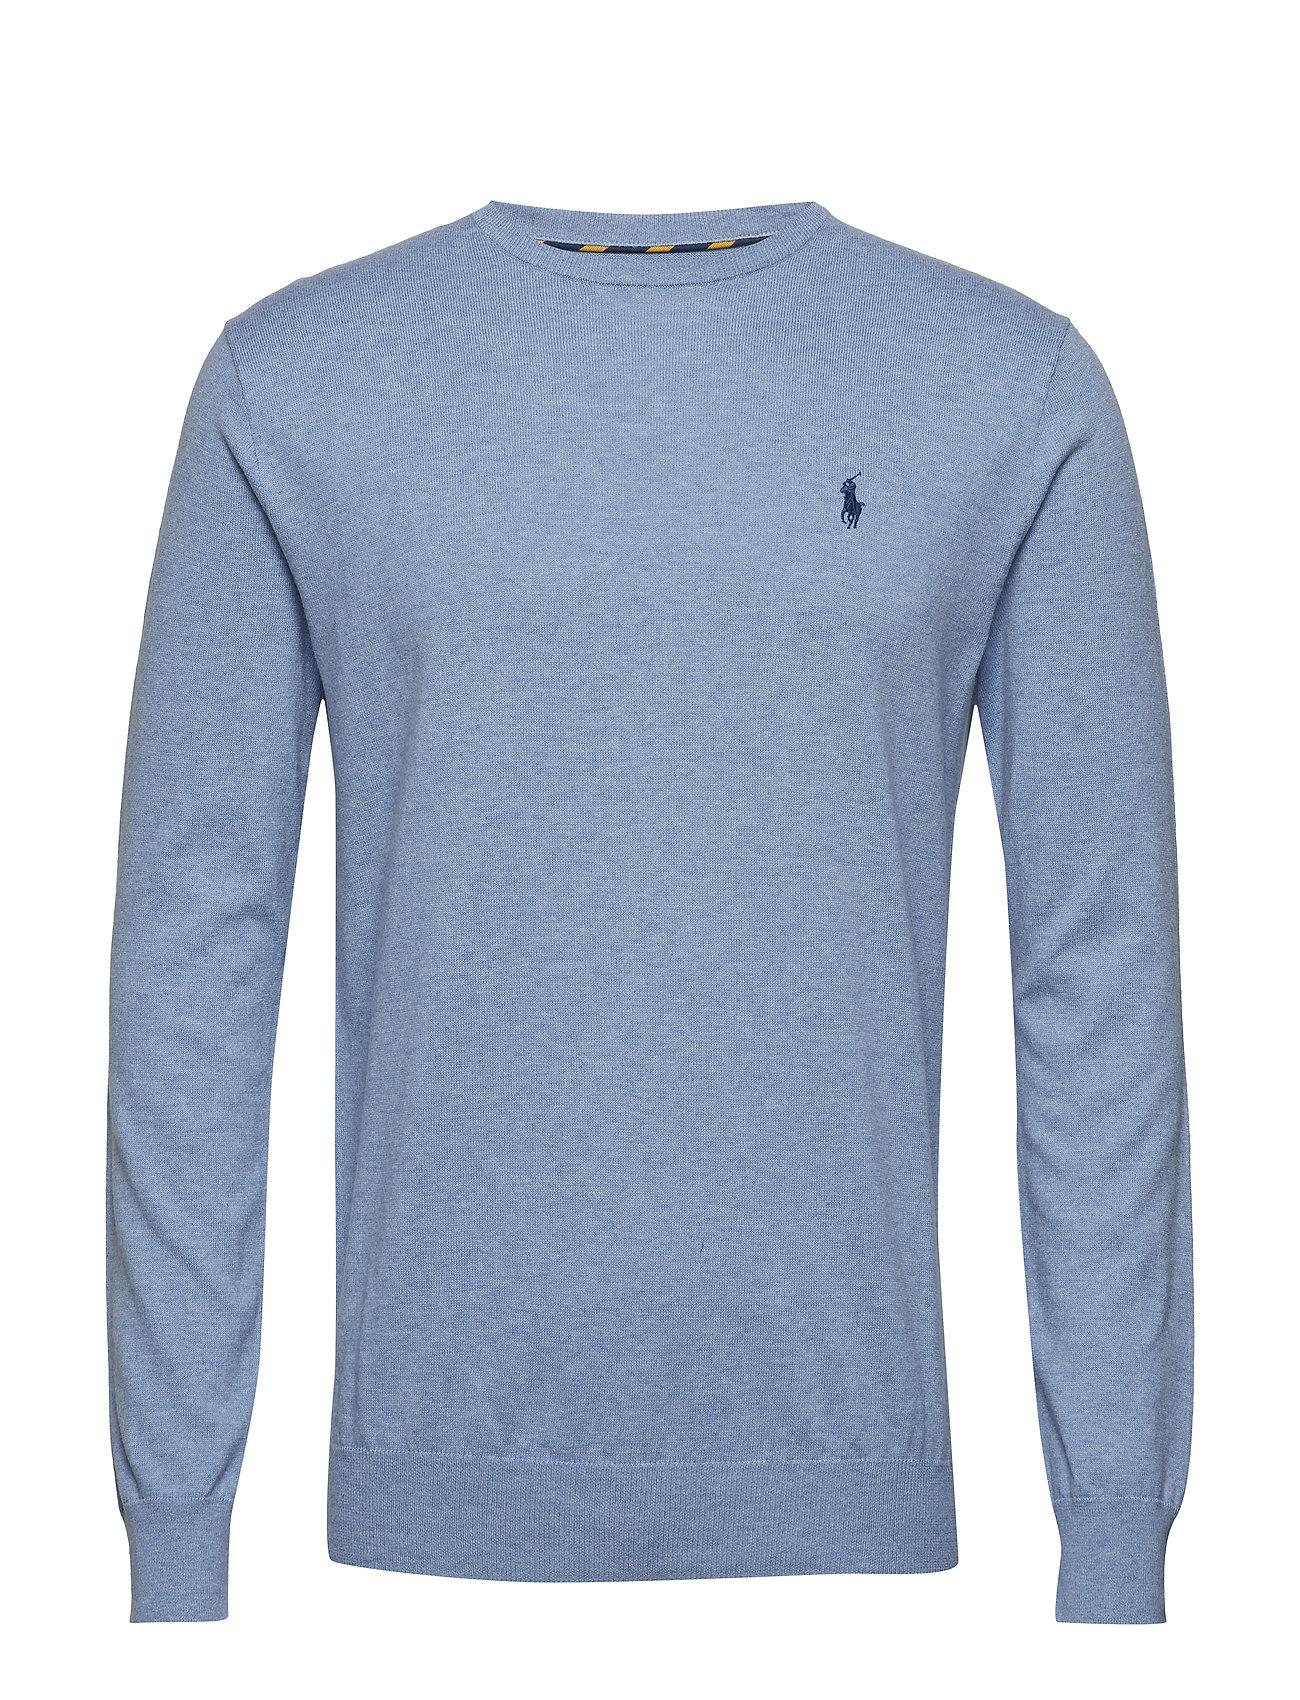 Polo Ralph Lauren LS SF CN PP-LONG SLEEVE-SWEATER - NEW CAMPUS BLUE H